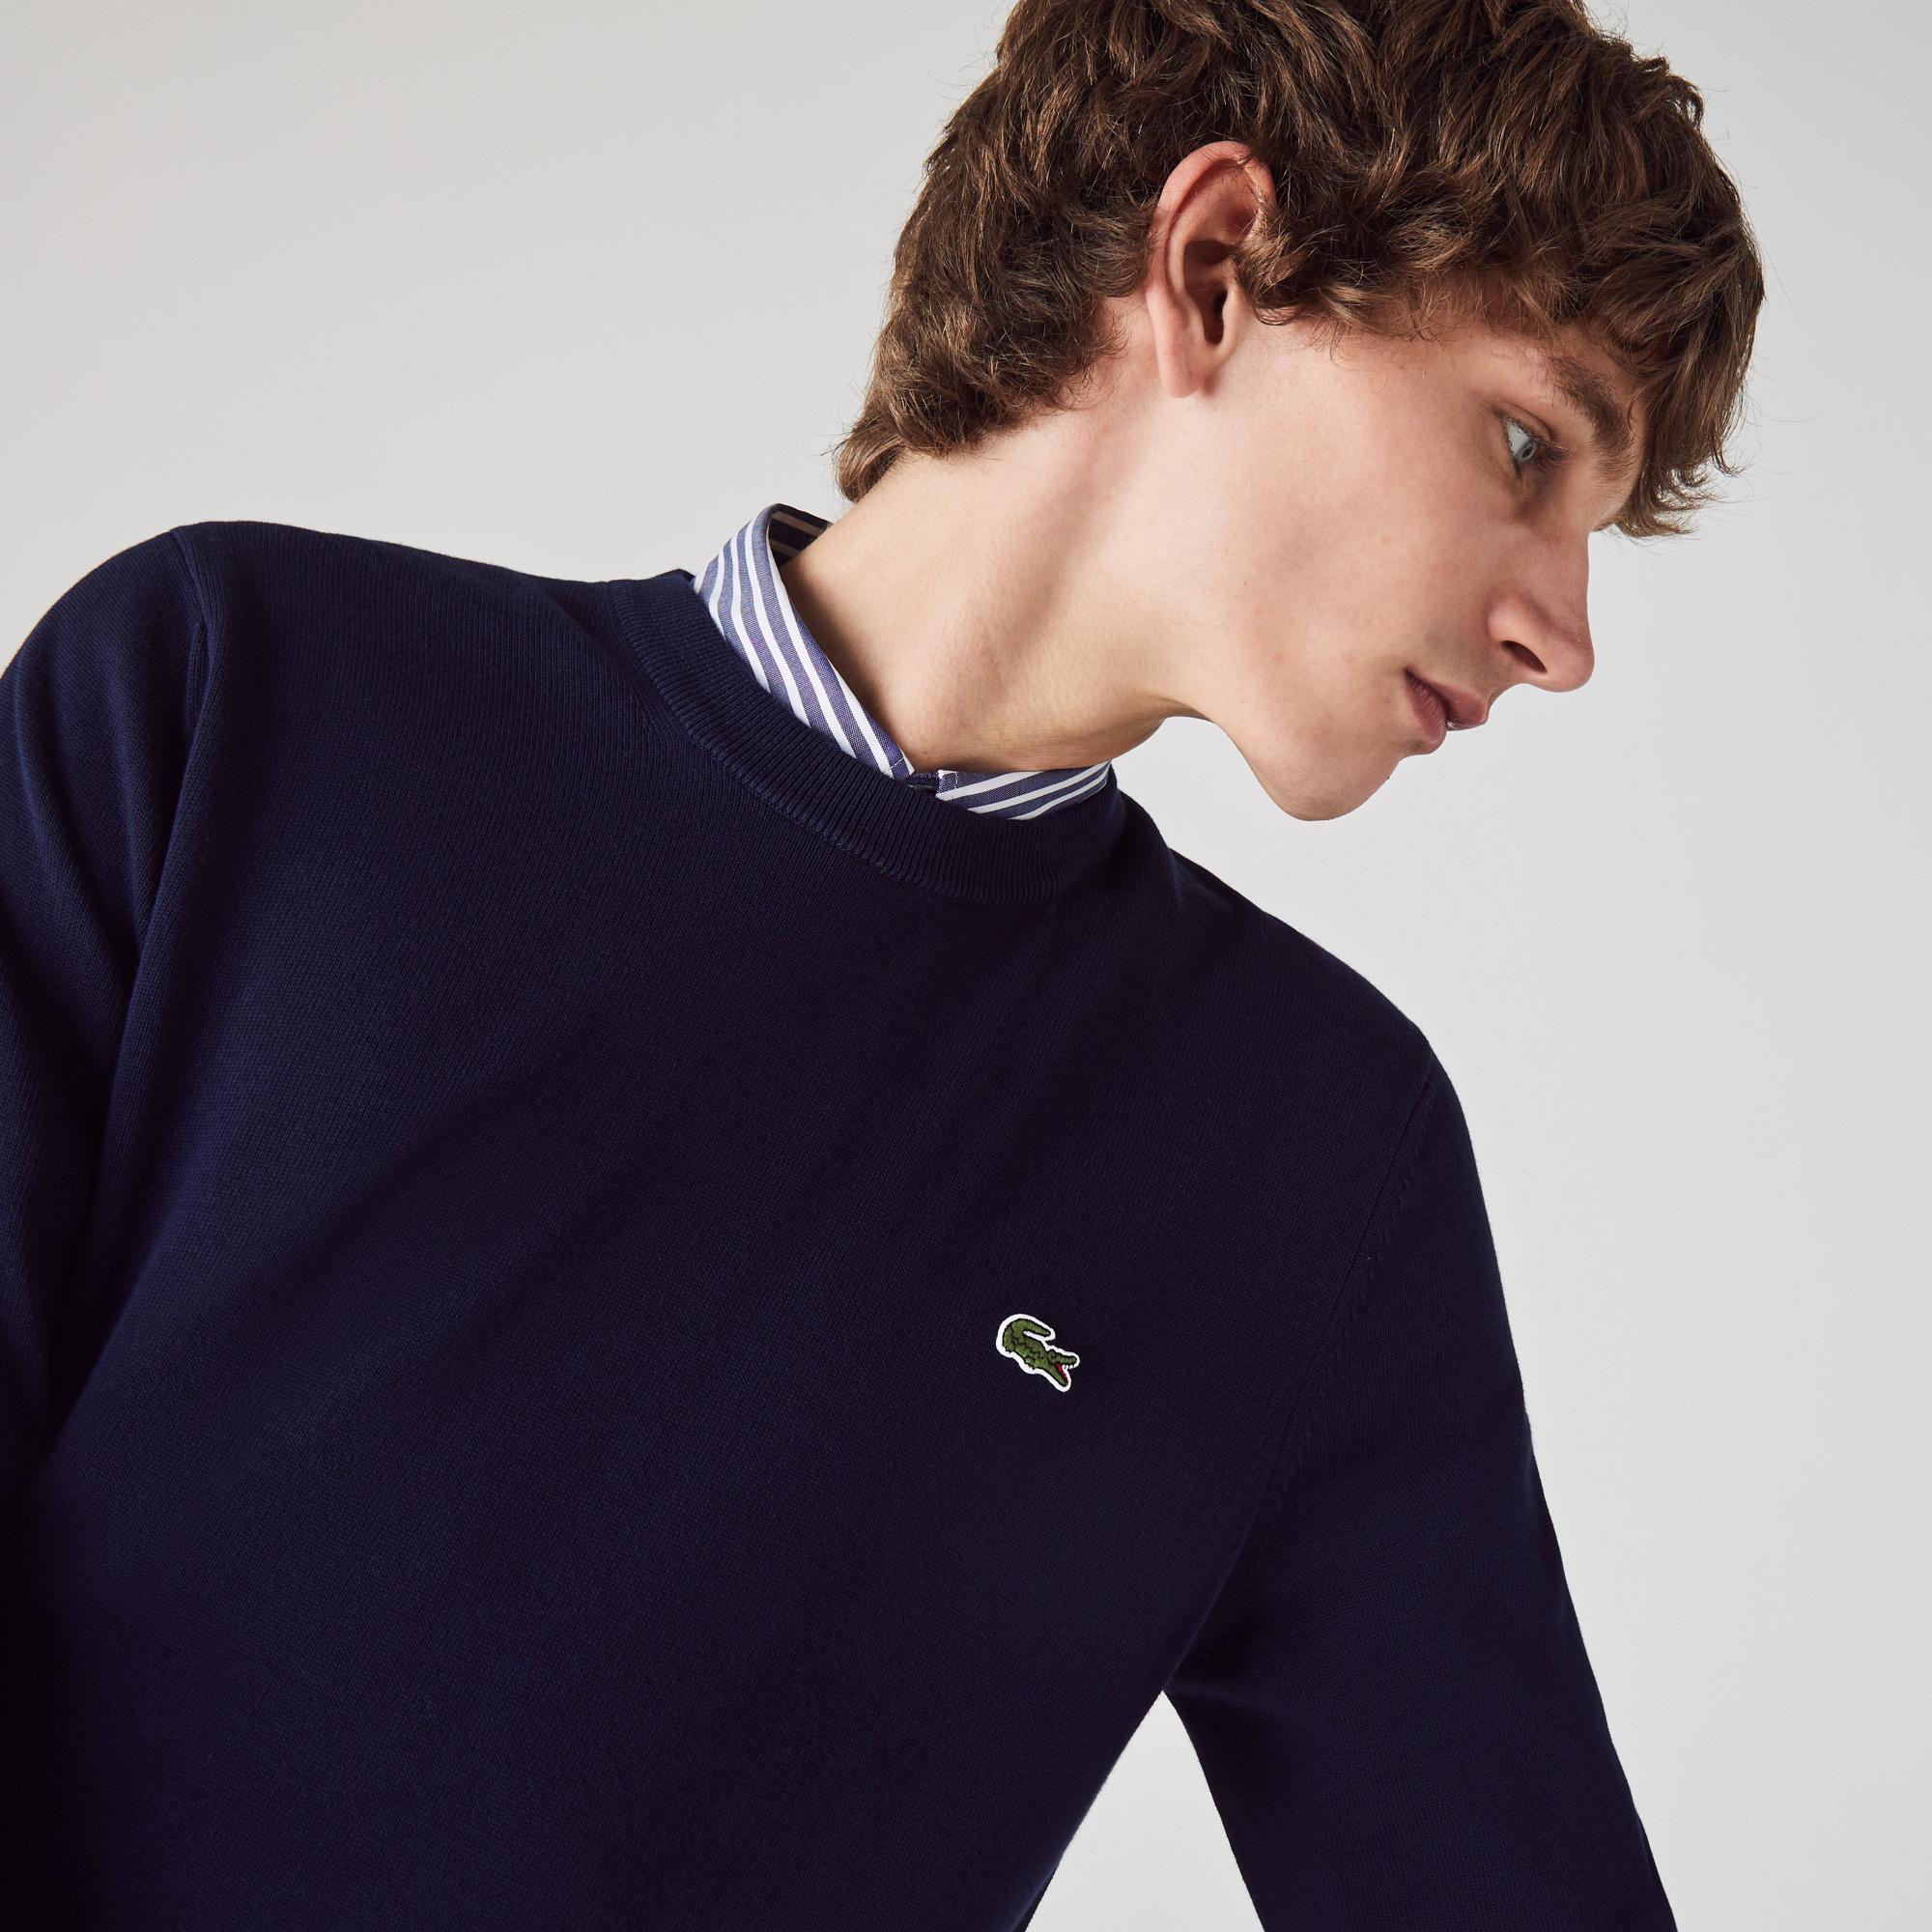 Lacoste Men's Organic Cotton Crew Neck Sweater